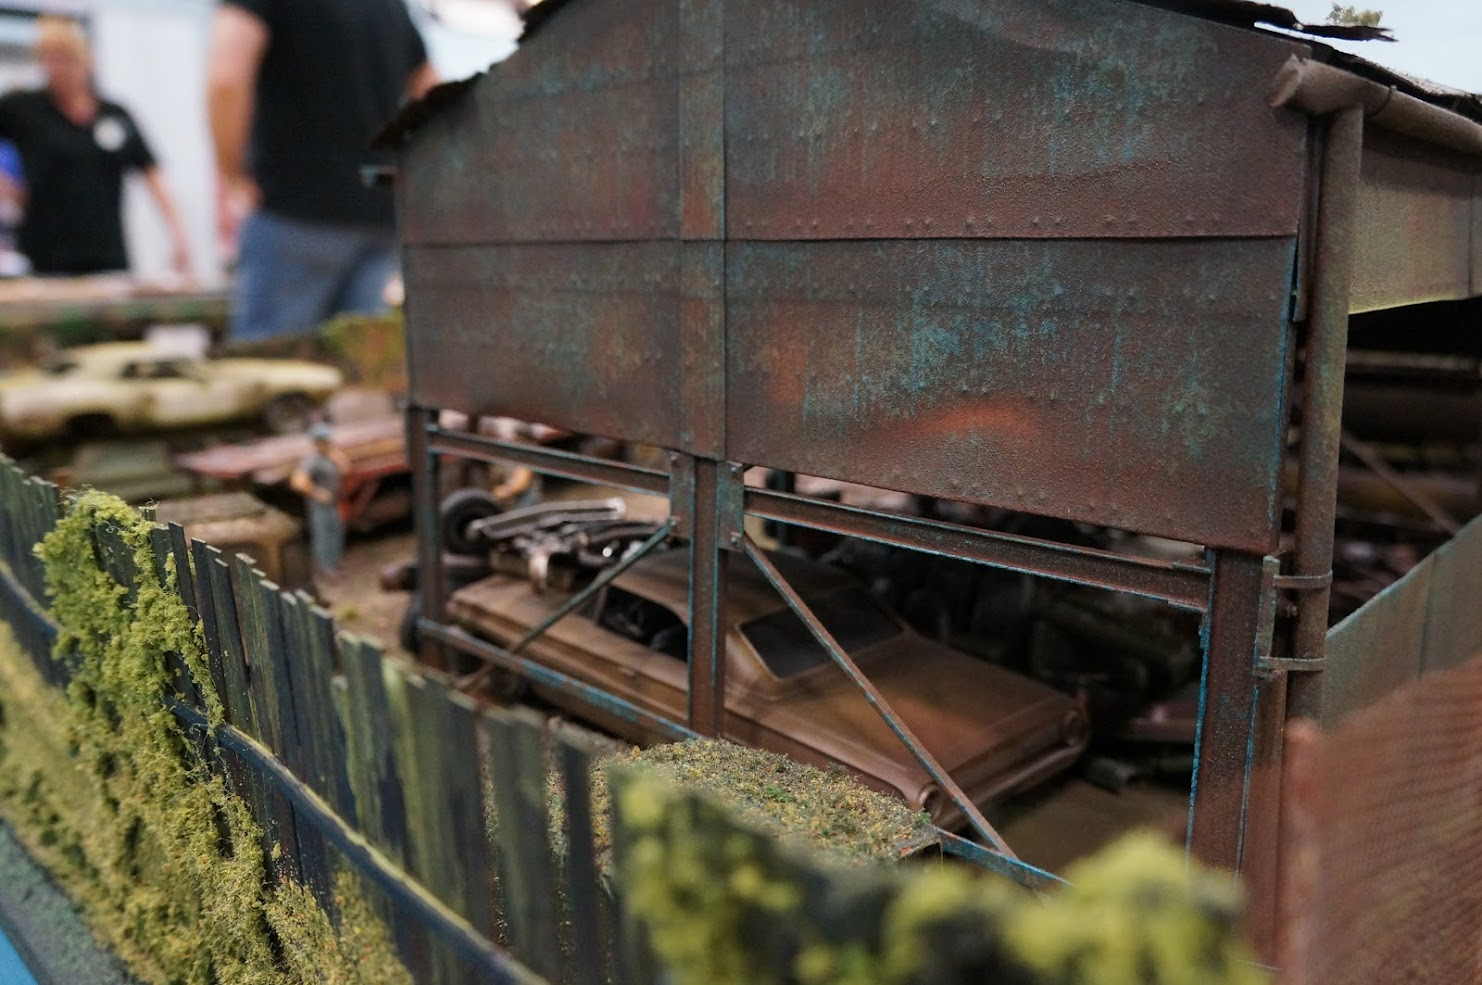 1 24 1 25 Barn Garage Diorama For Sale On Ebay: Interstate Classics, Wrecking Yard 1/25 Scale Model